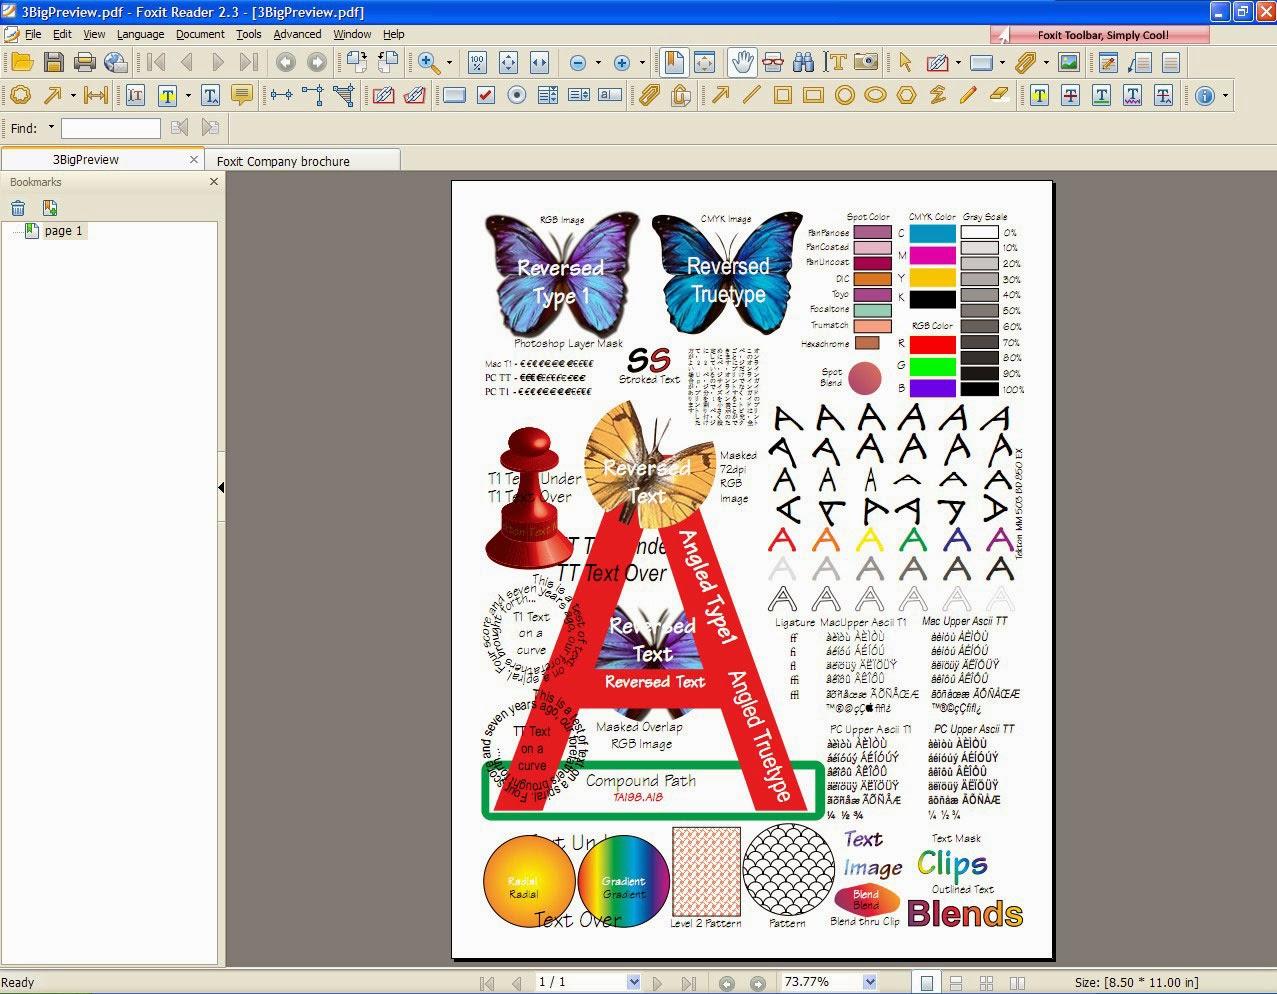 download chuong trinh doc file pdf free